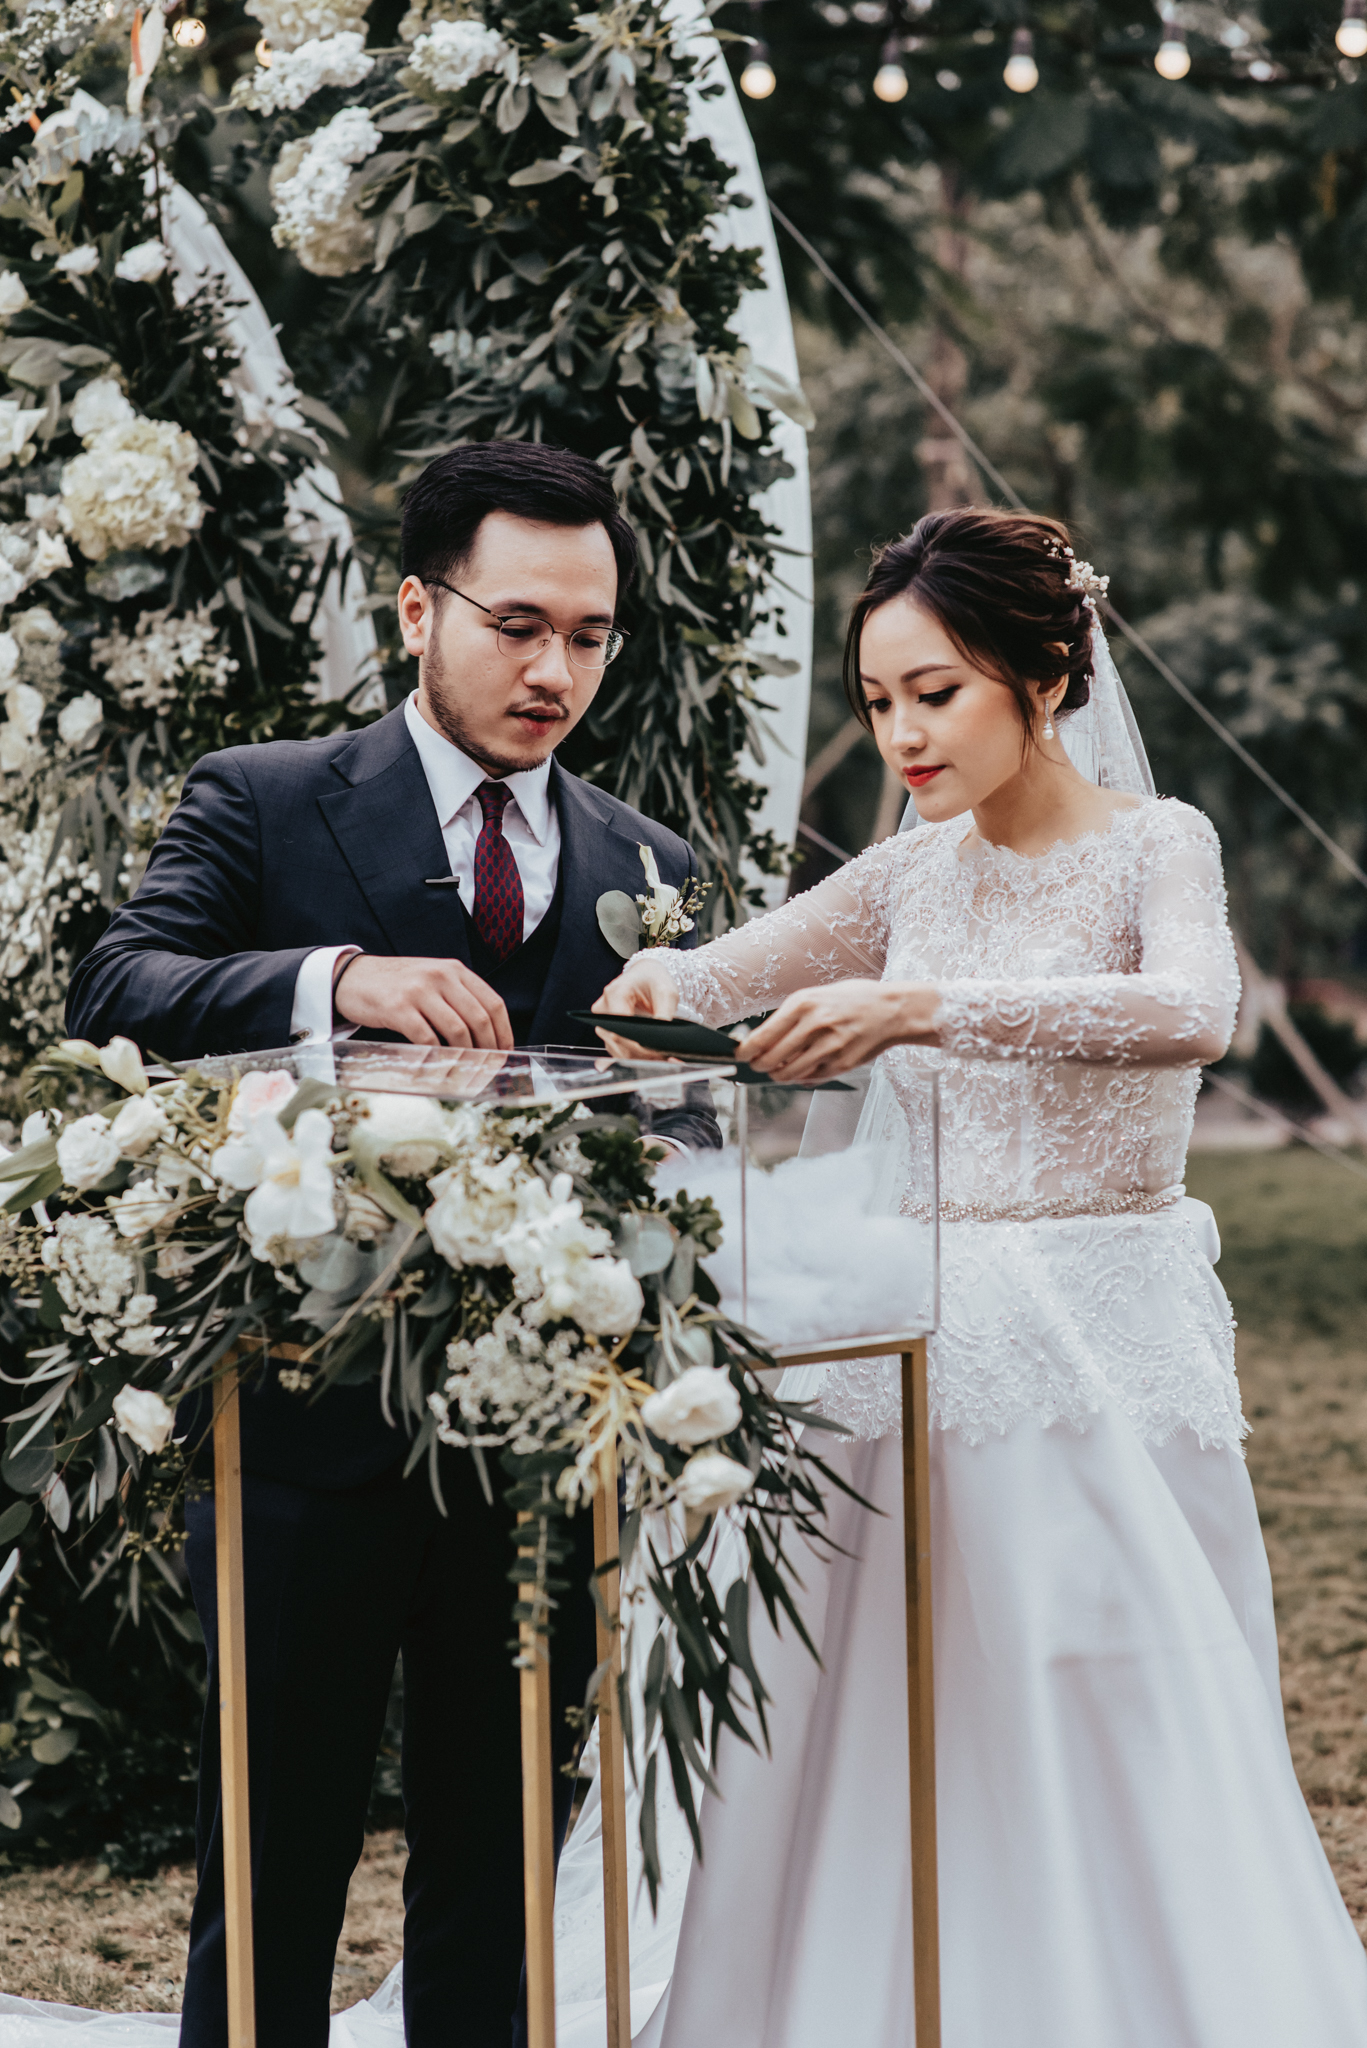 JWMarriott Ha Noi Intimate Wedding of Trang Hi well captured by Hipster Wedding Vietnam Wedding Photographer-4171.jpg